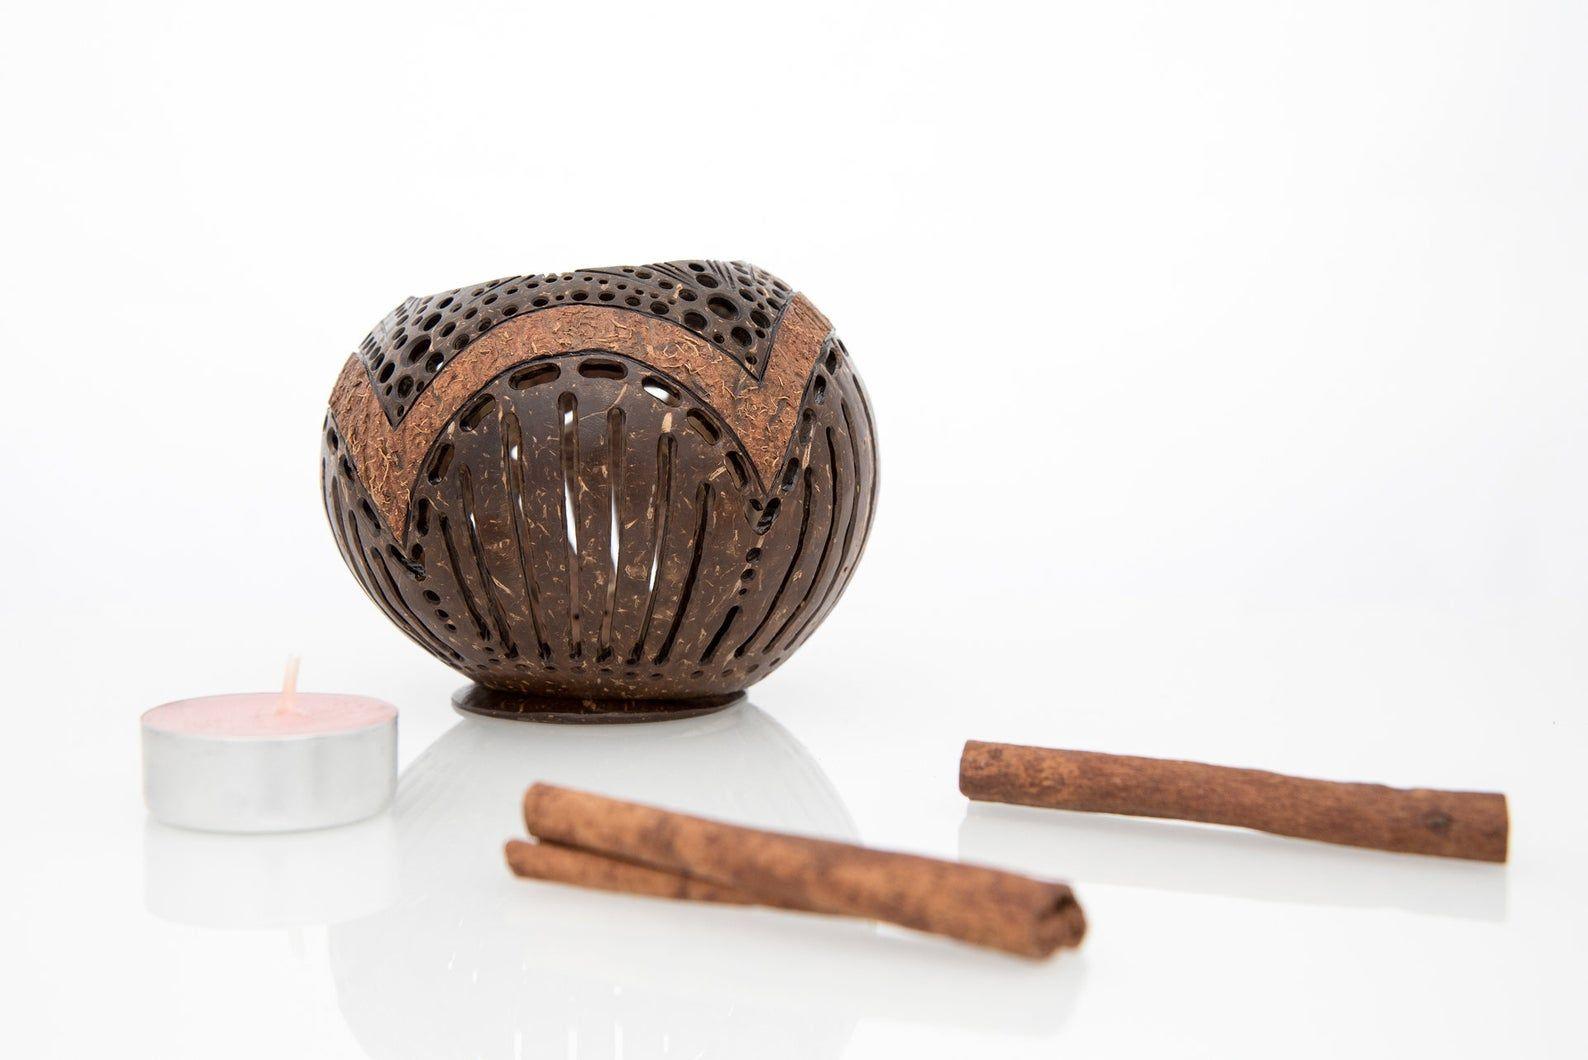 Universal Gyro Bowl Anti Spill Schussel Glatte 360 Grad Rotation